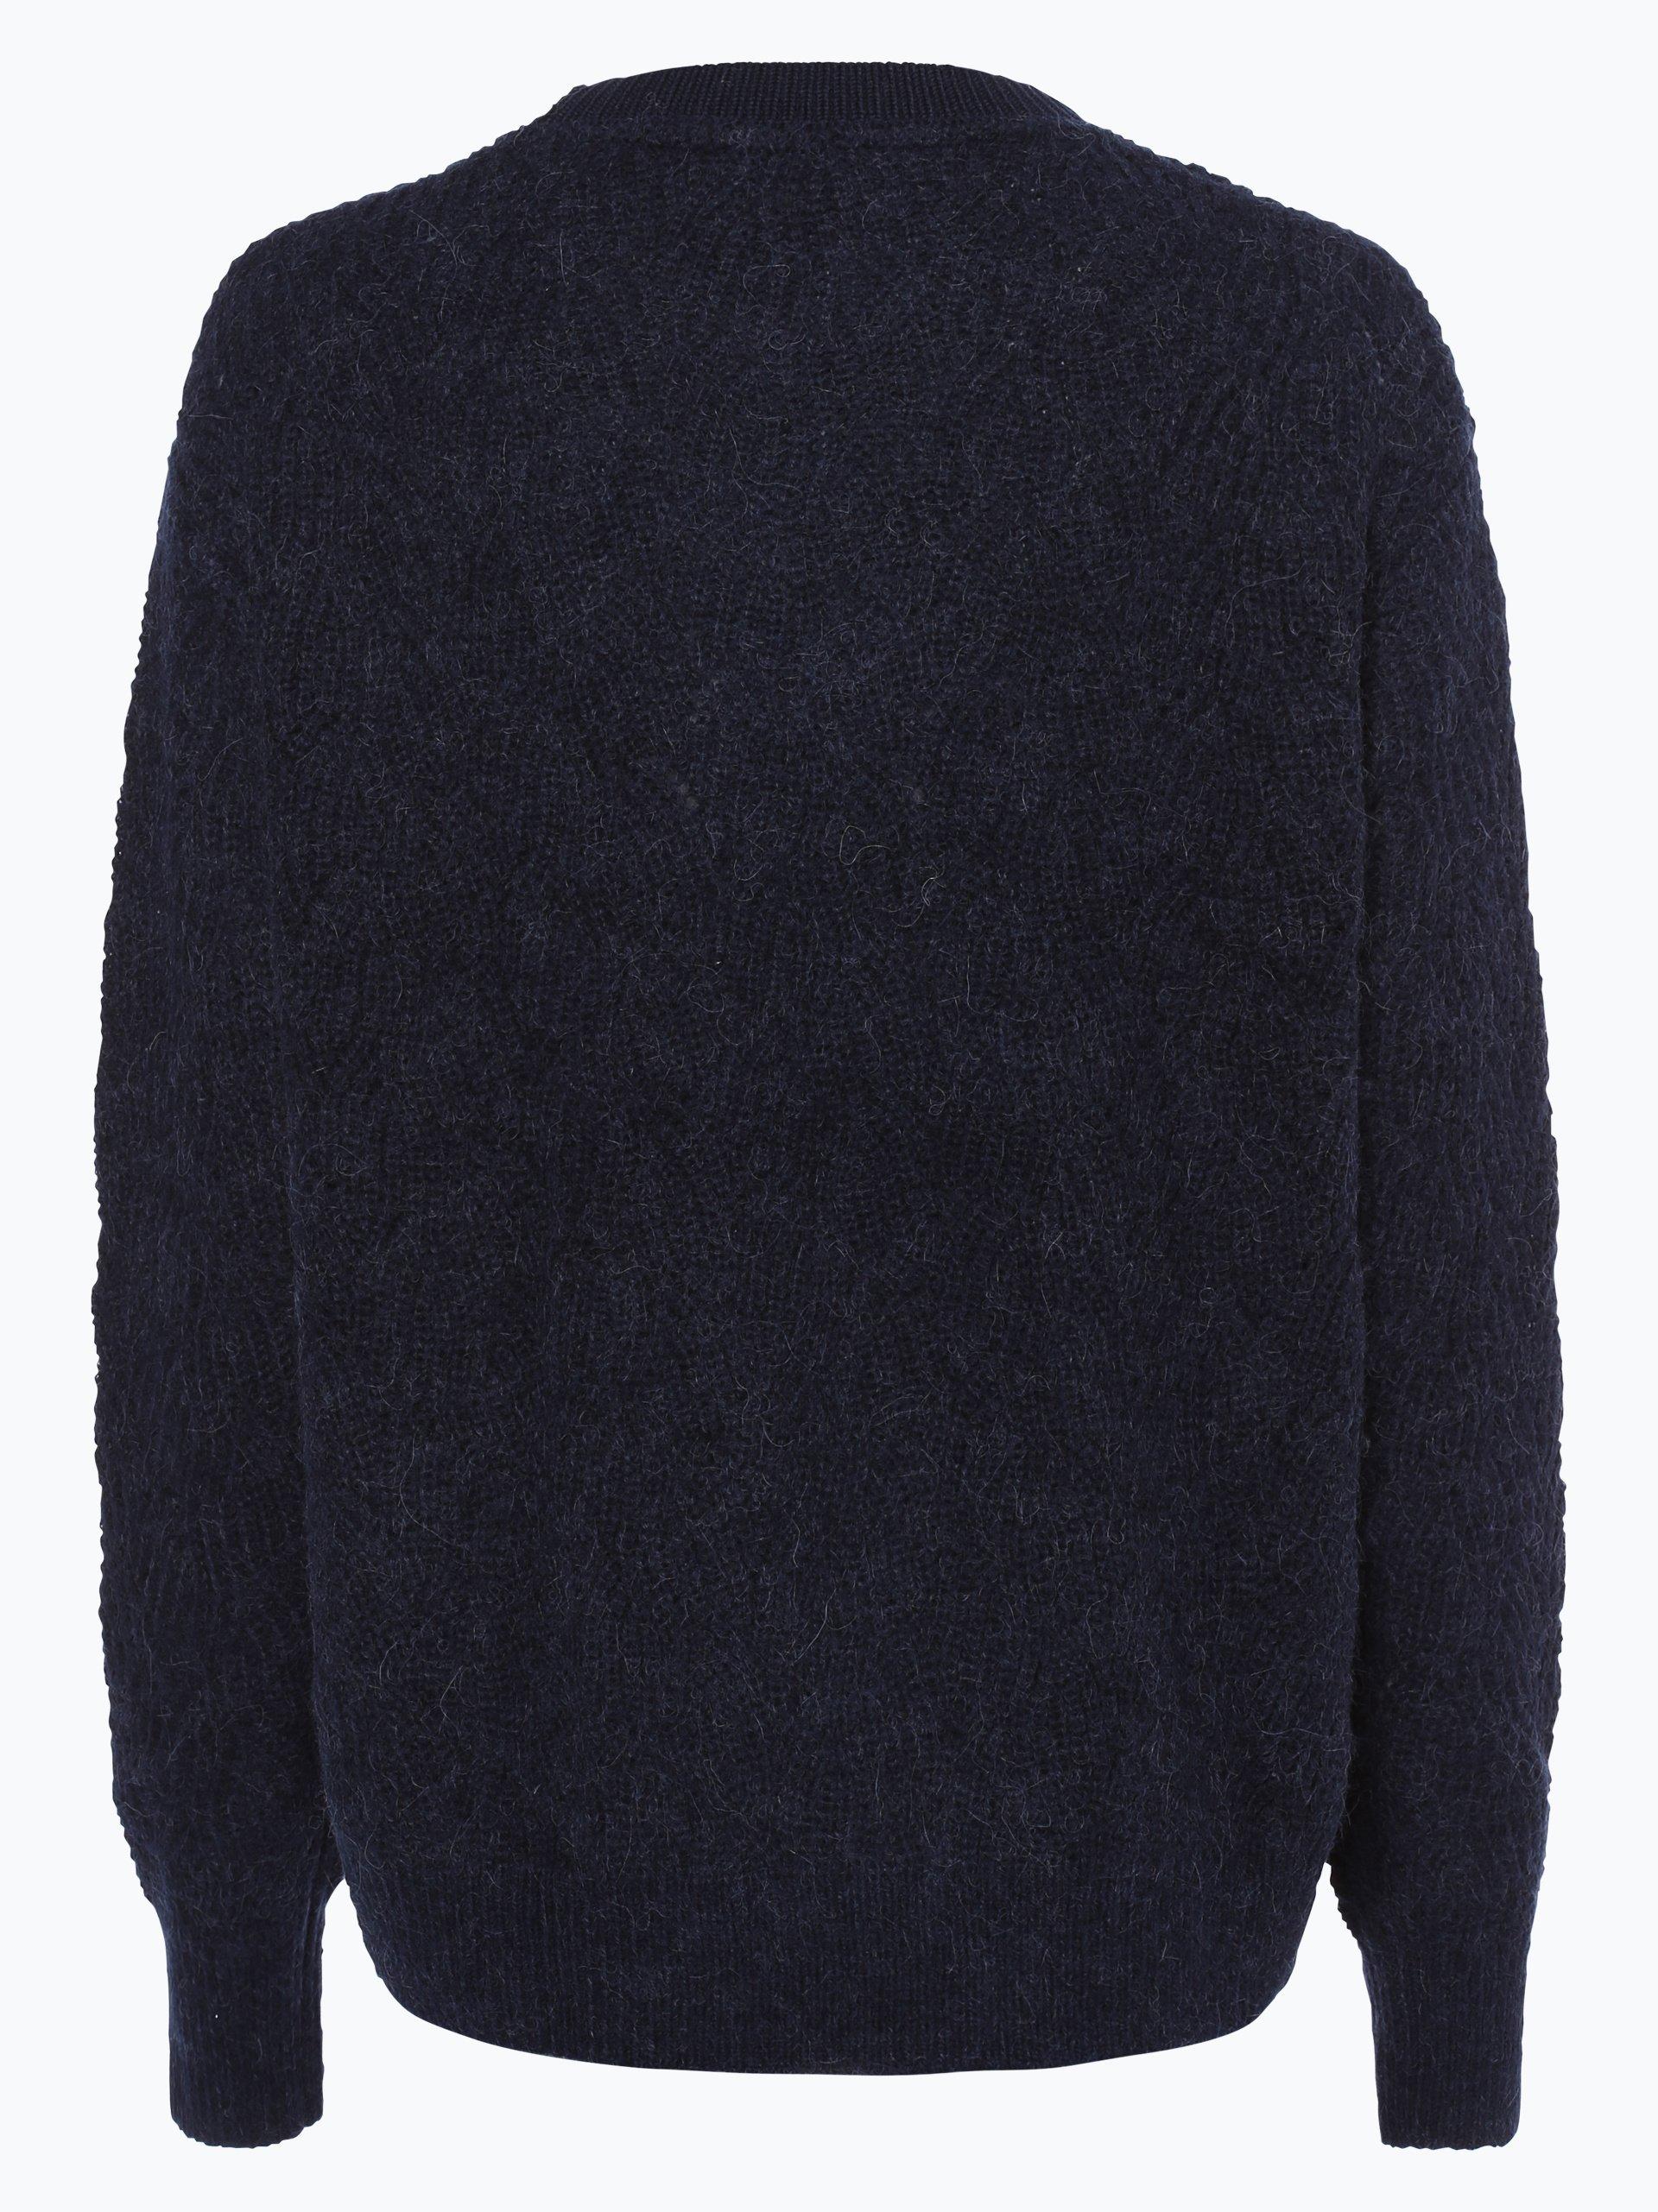 tommy hilfiger damen pullover mit alpaka anteil marine uni. Black Bedroom Furniture Sets. Home Design Ideas